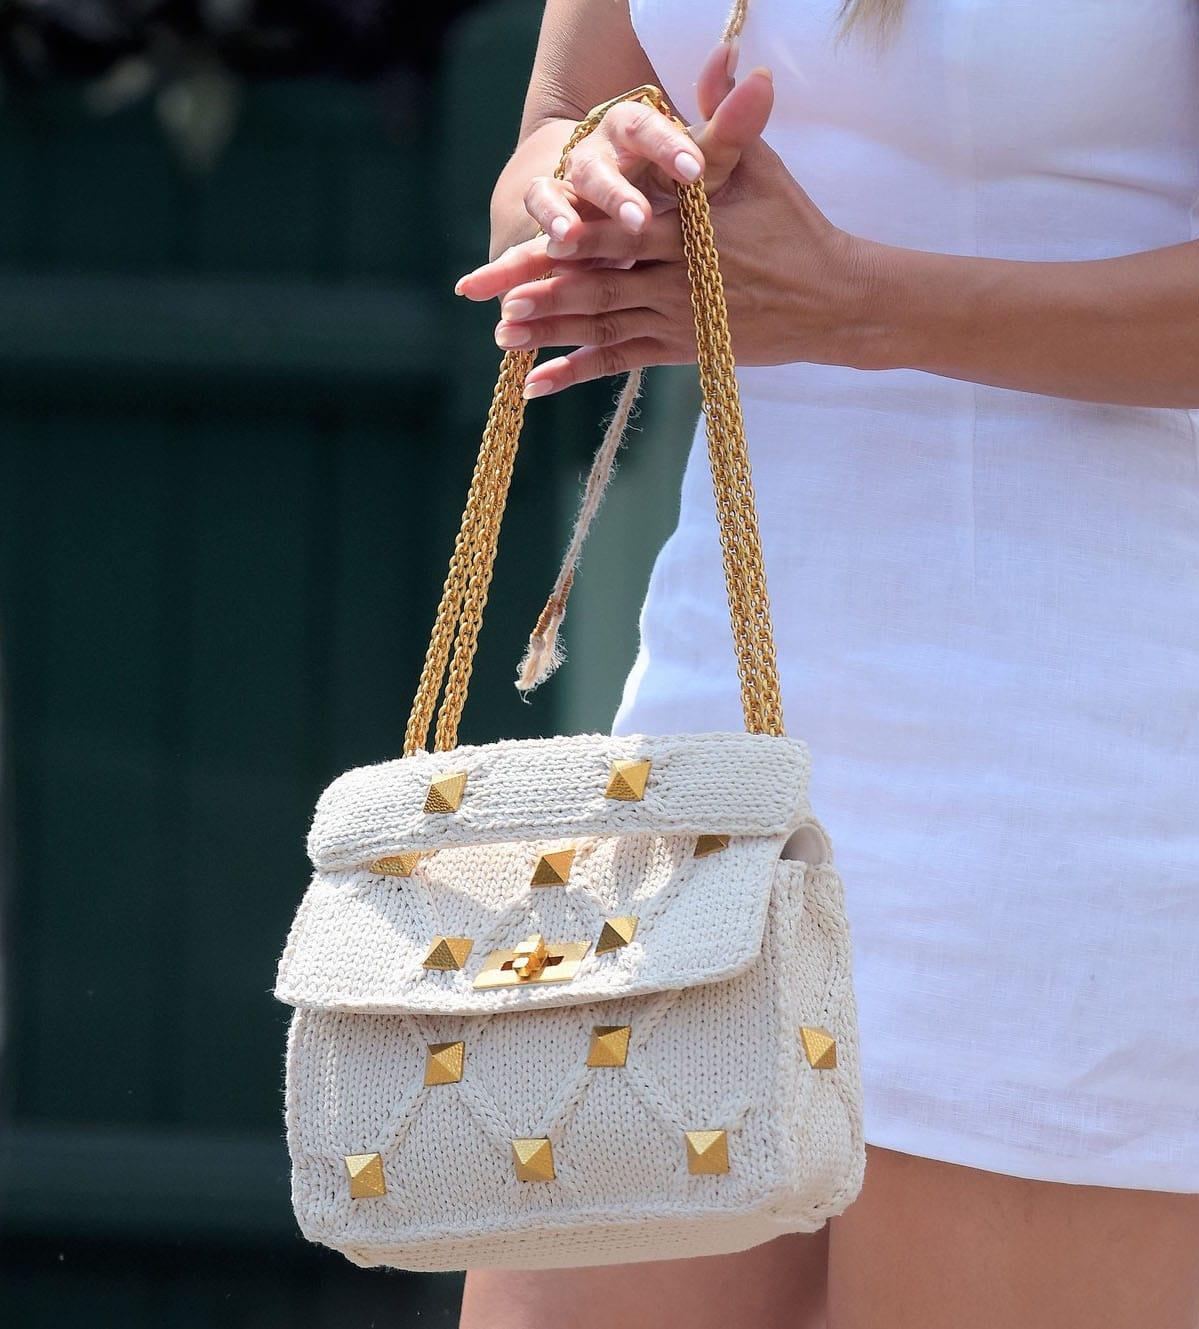 Jennifer Lopez pairs her summery white dress with Valentino Garavani Roman Stud crochet bag